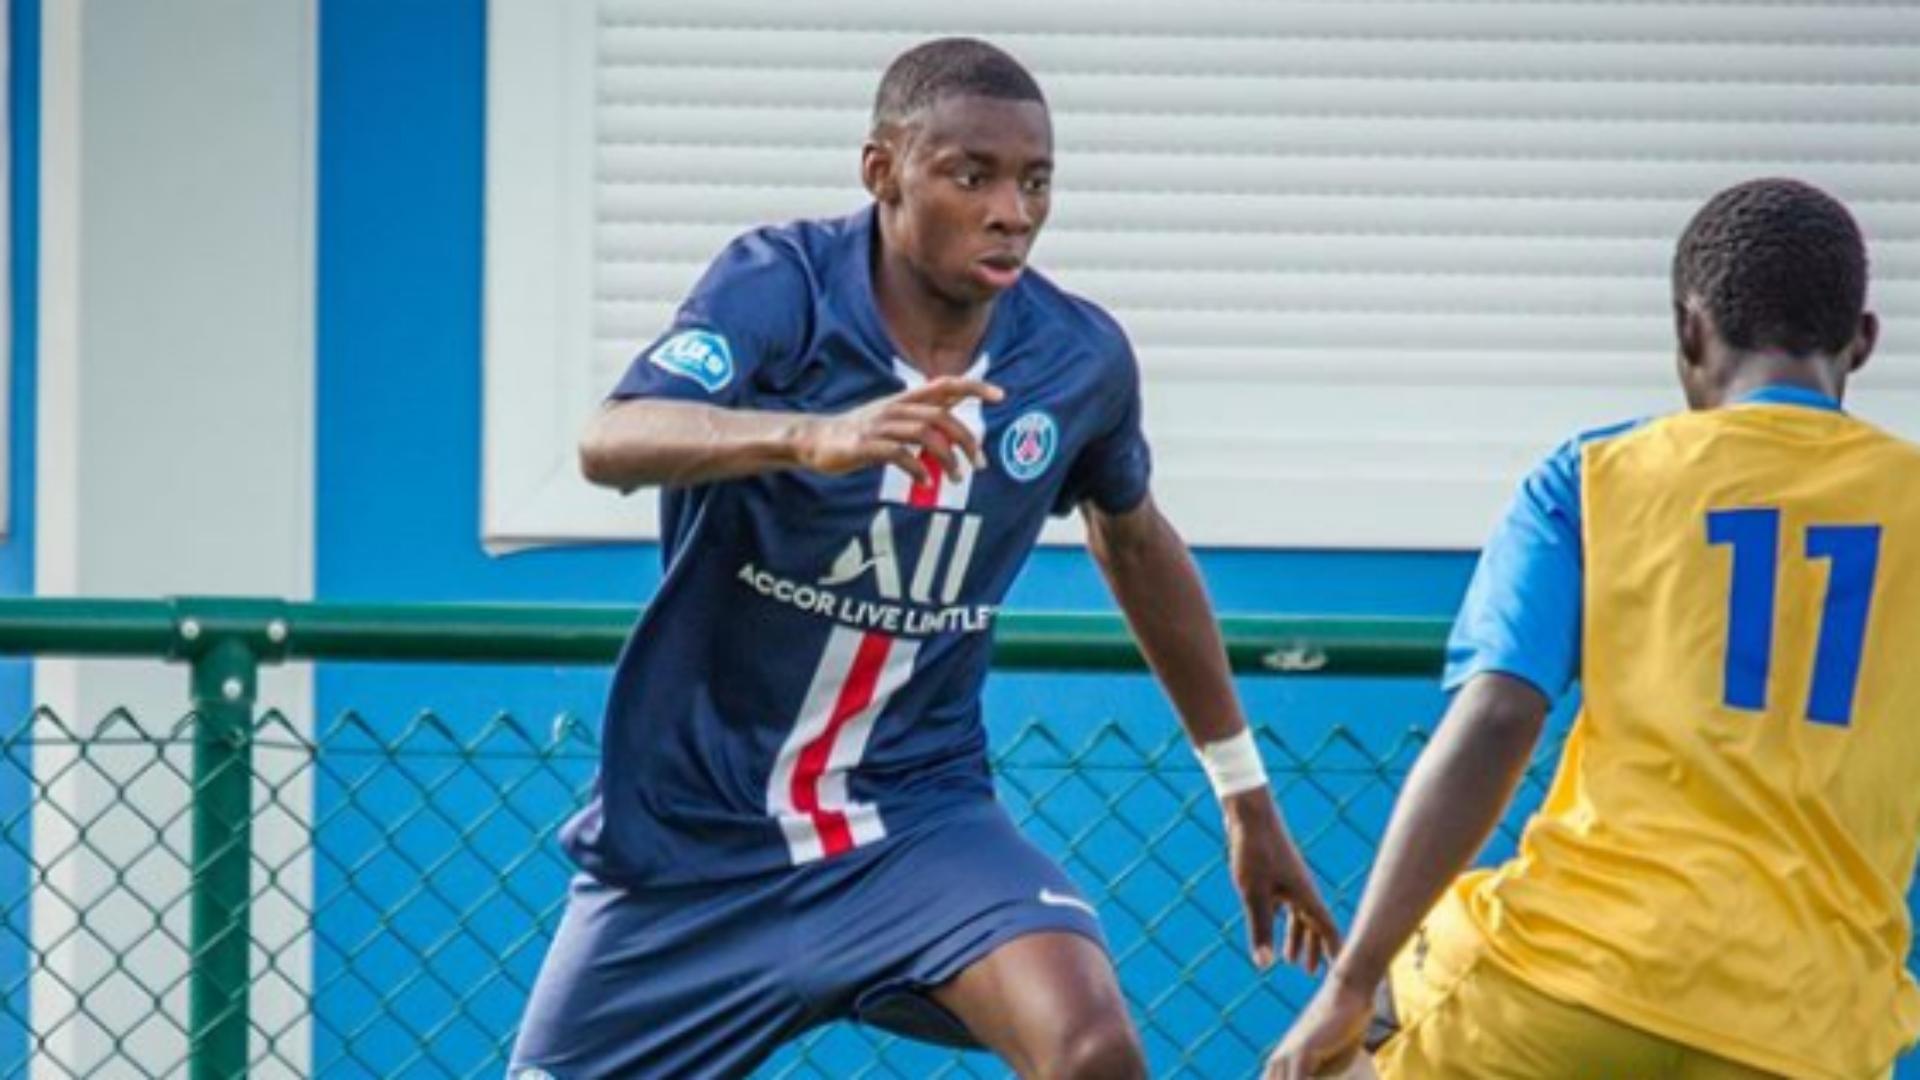 PSG confirm senior deal for academy talent Nagera